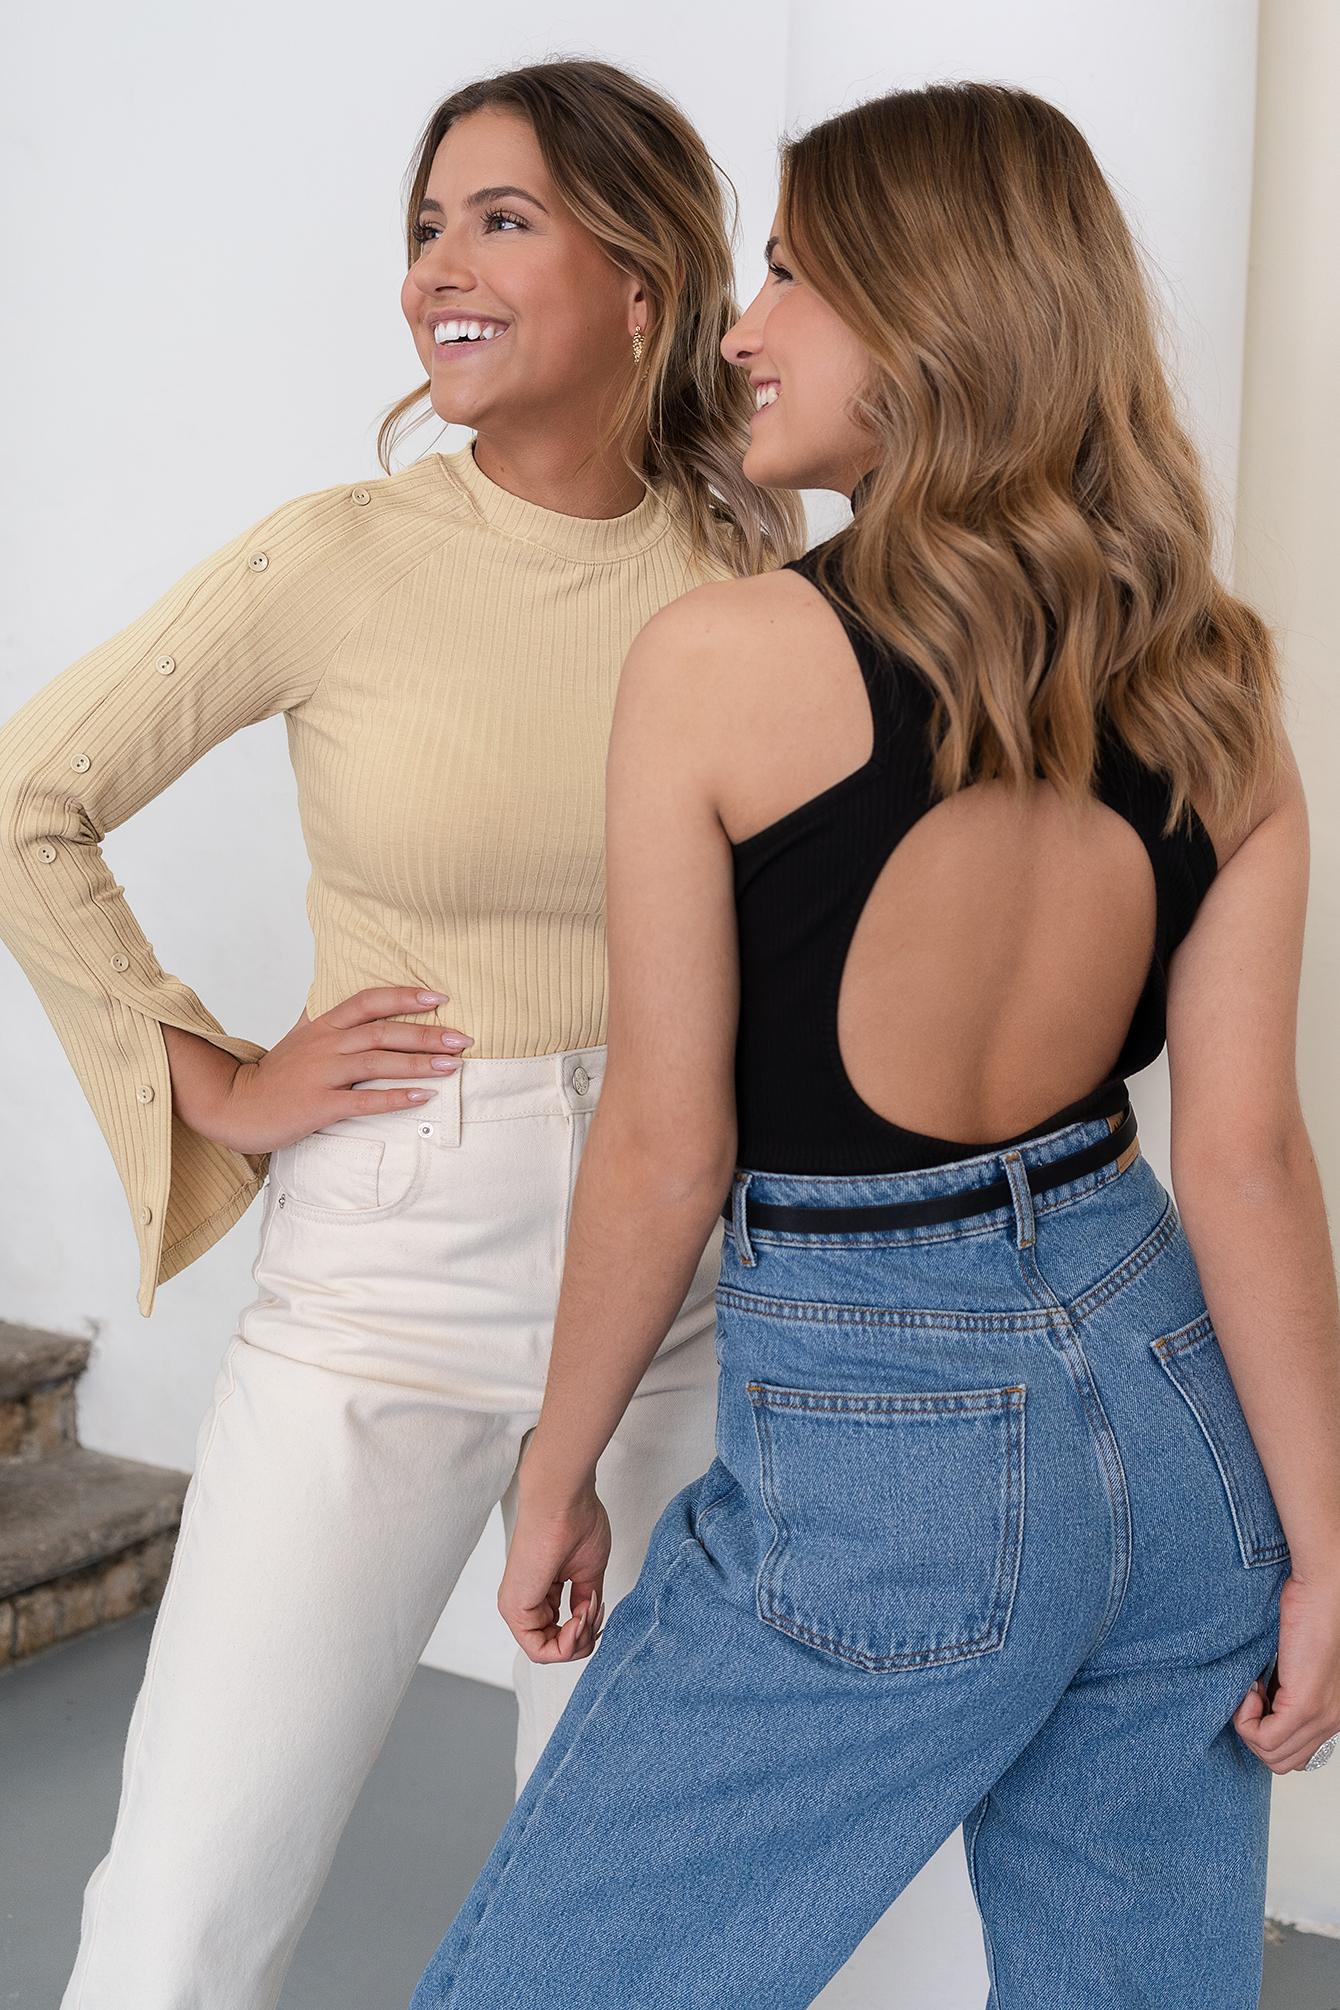 dahl sisters x na-kd -  Gerippter Body Mit Offenem Rücken - Black